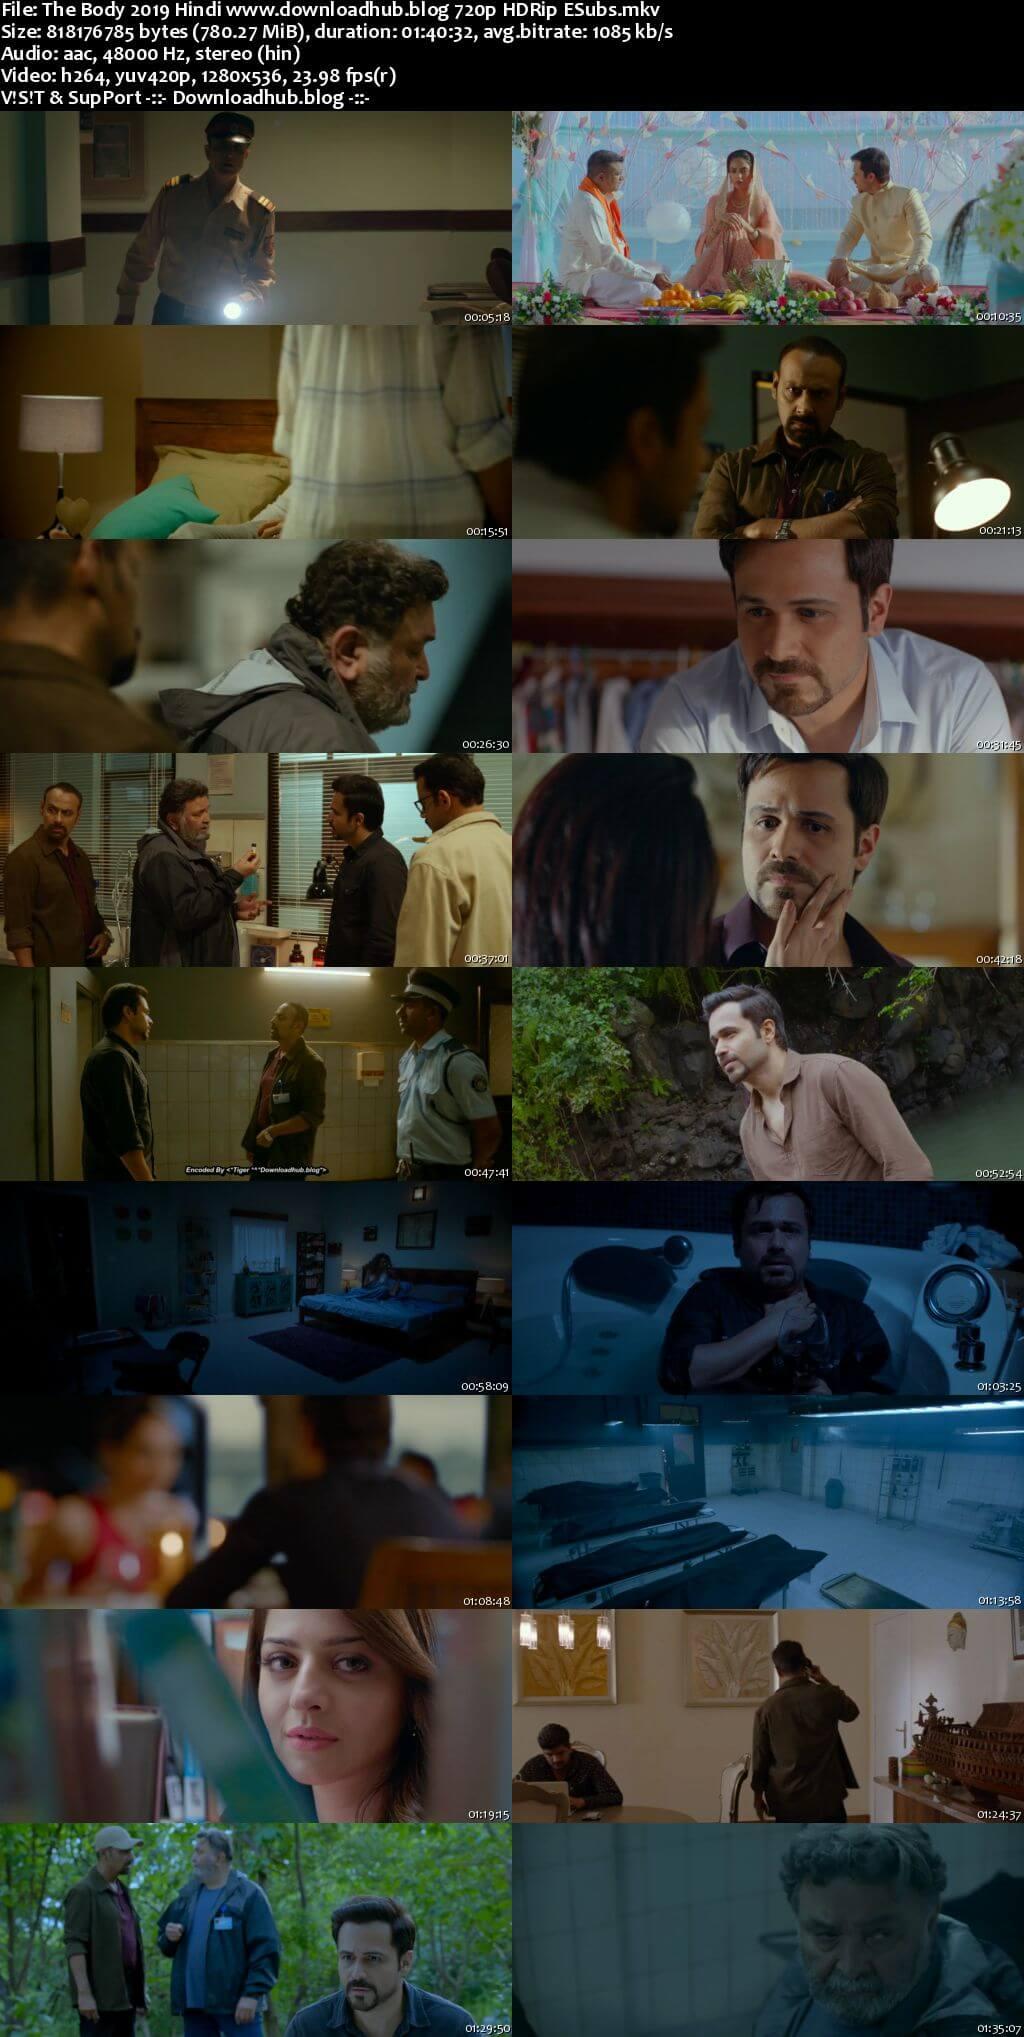 The Body 2019 Hindi 720p HDRip ESubs